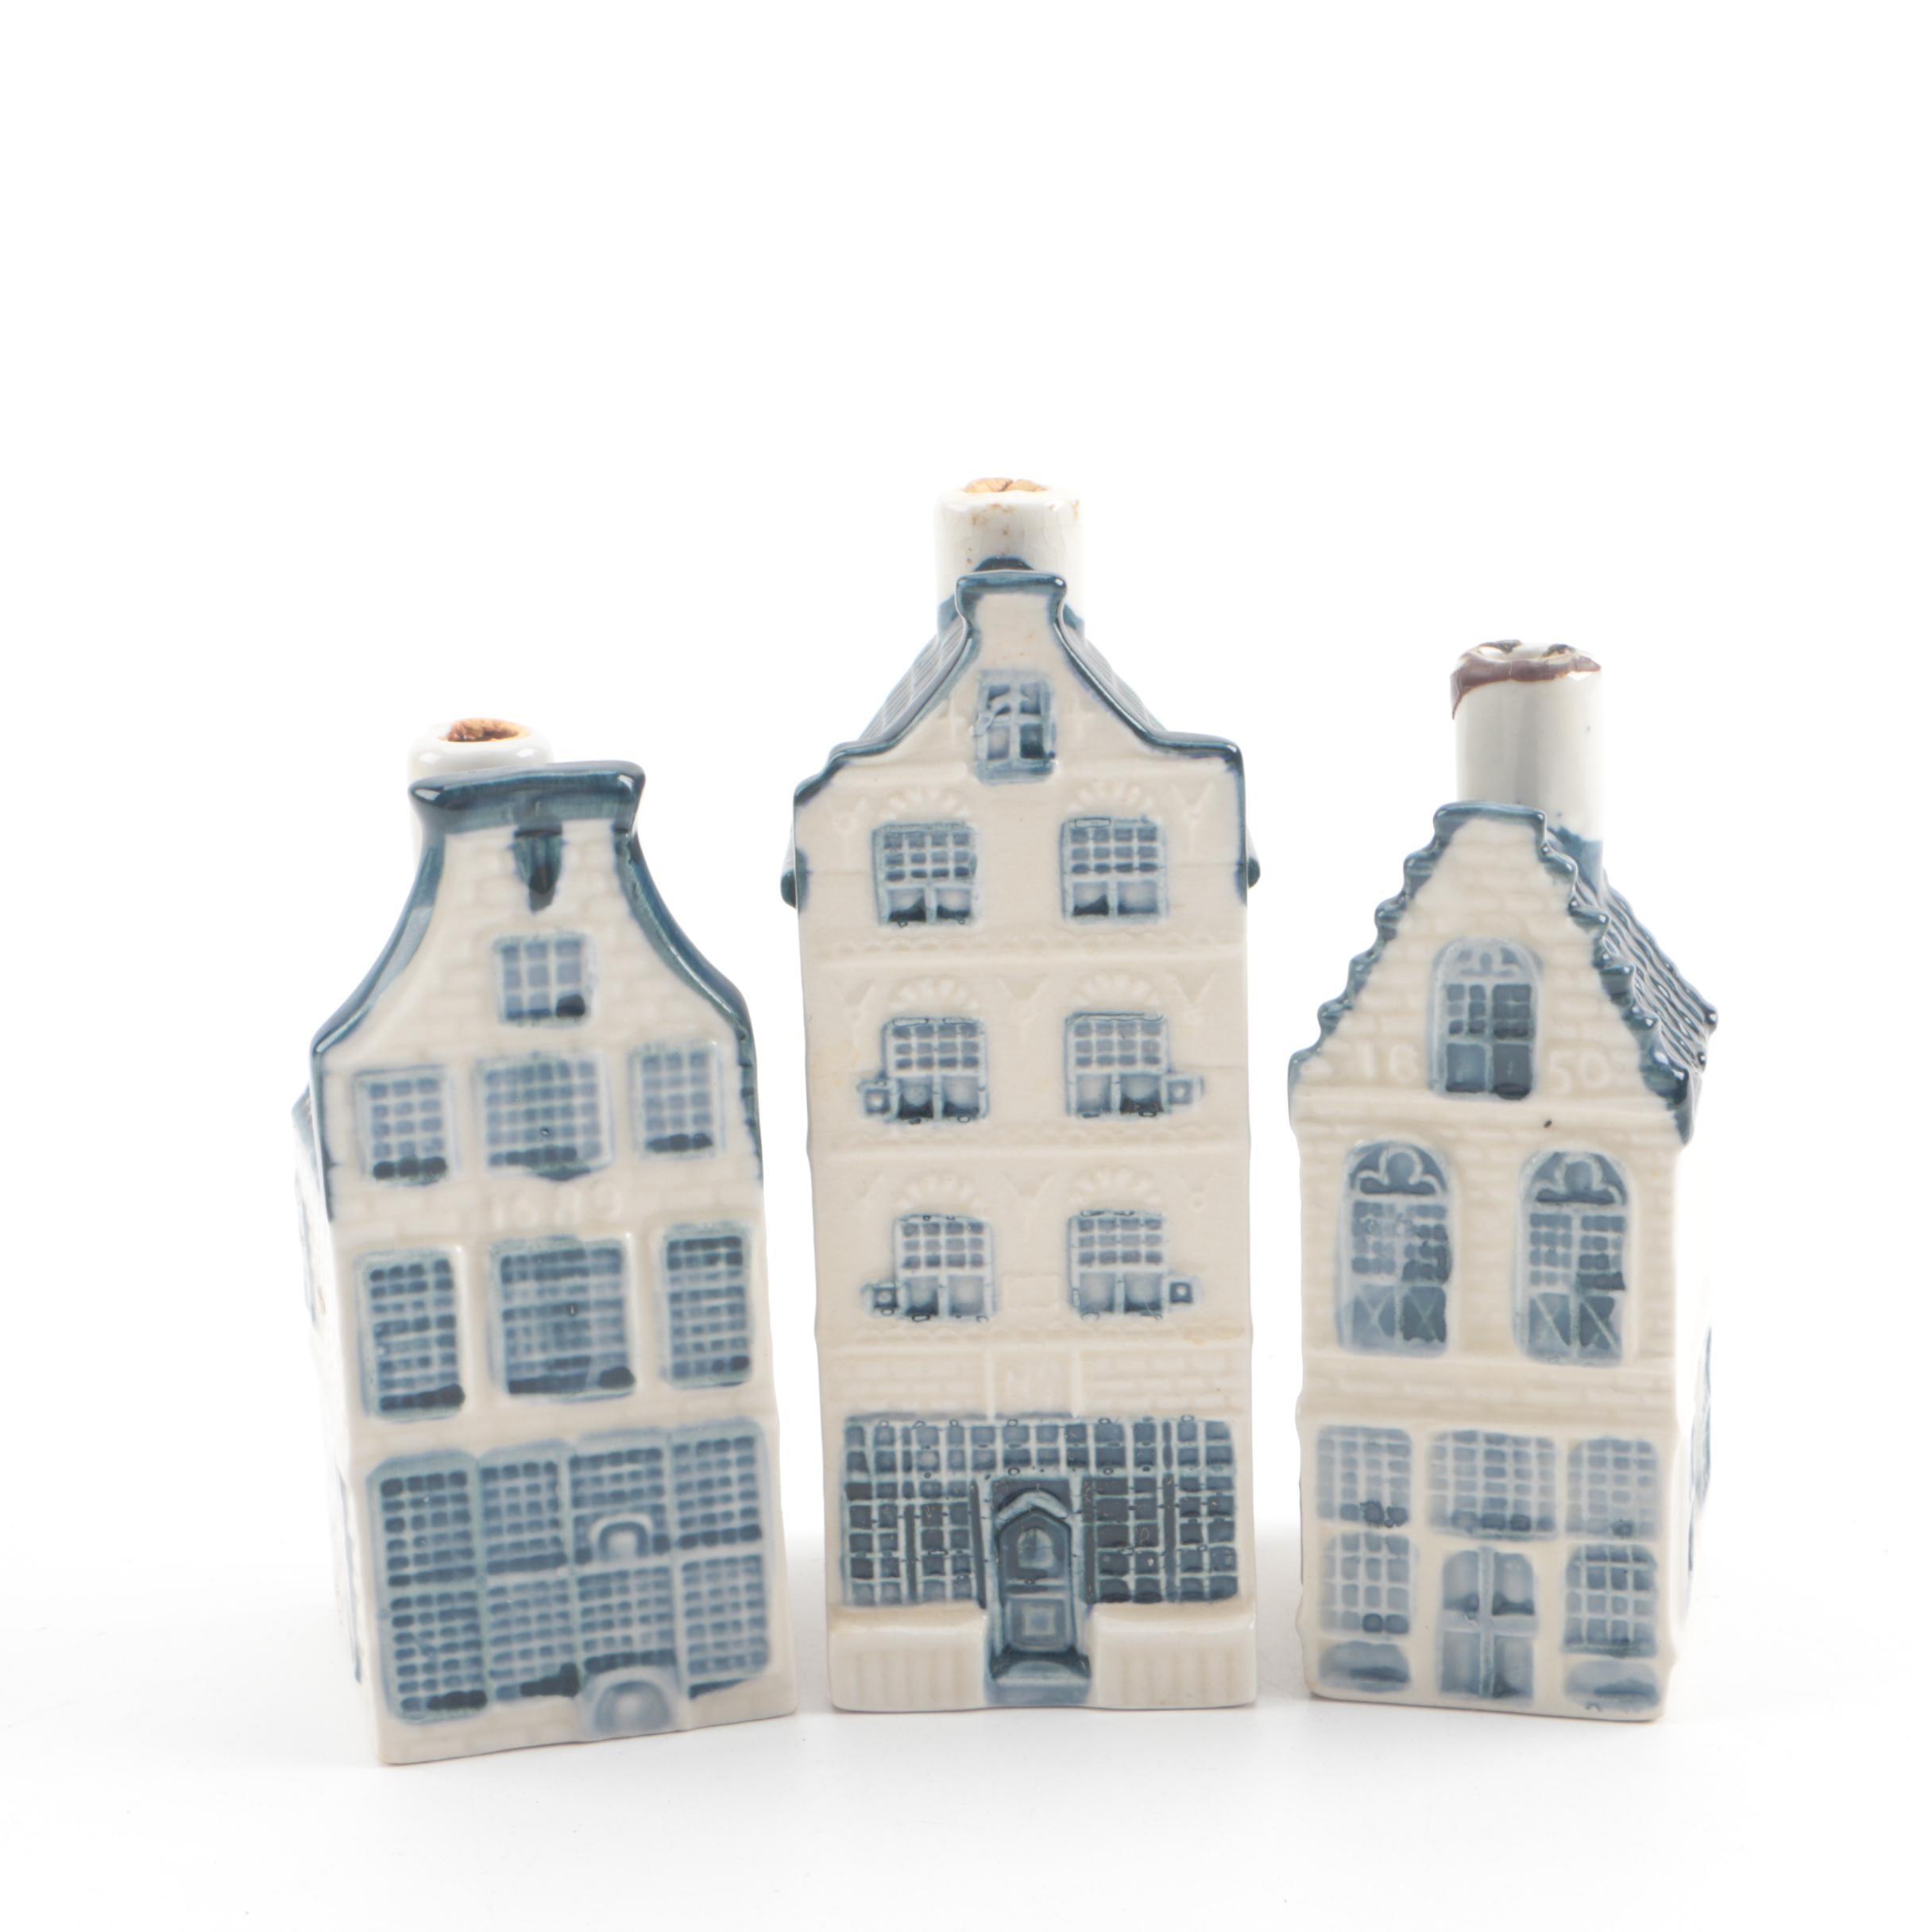 KLM for Rynbende Distillery Delf Blue Porcelain Canal House Miniature Decanters